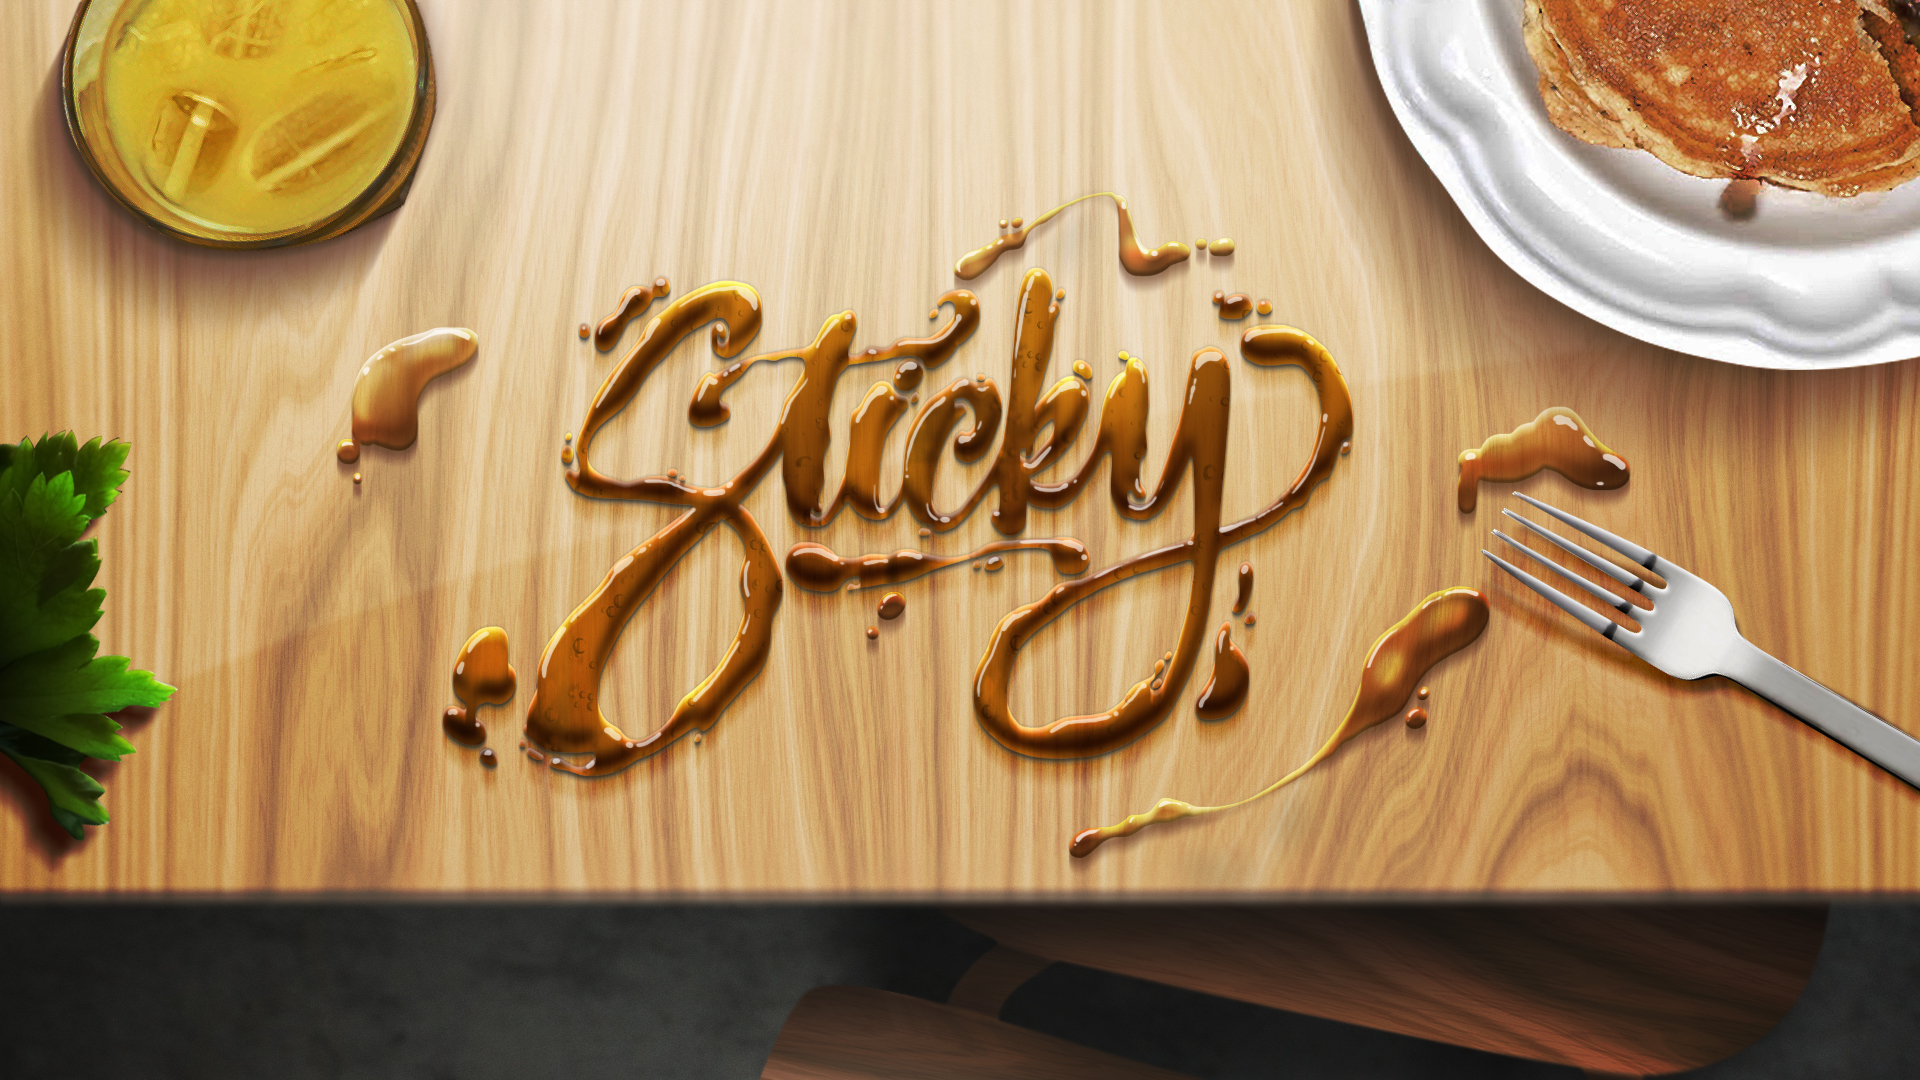 Clorox_sticky_01.jpg